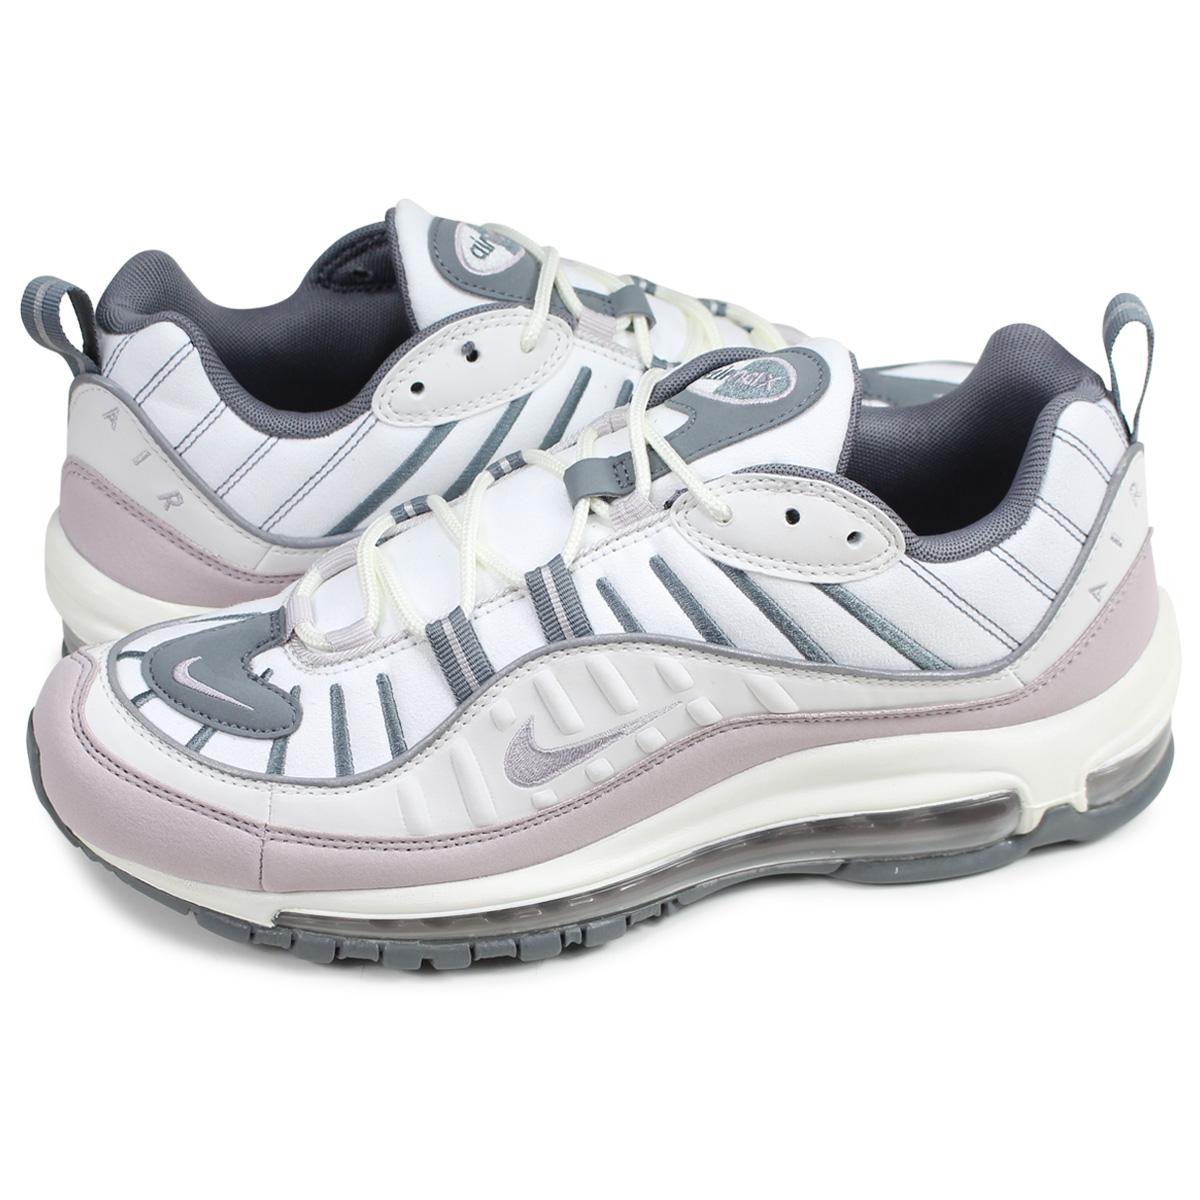 Nike NIKE Air Max 98 sneakers Lady's men WMNS AIR MAX 98 white white AH6799 111